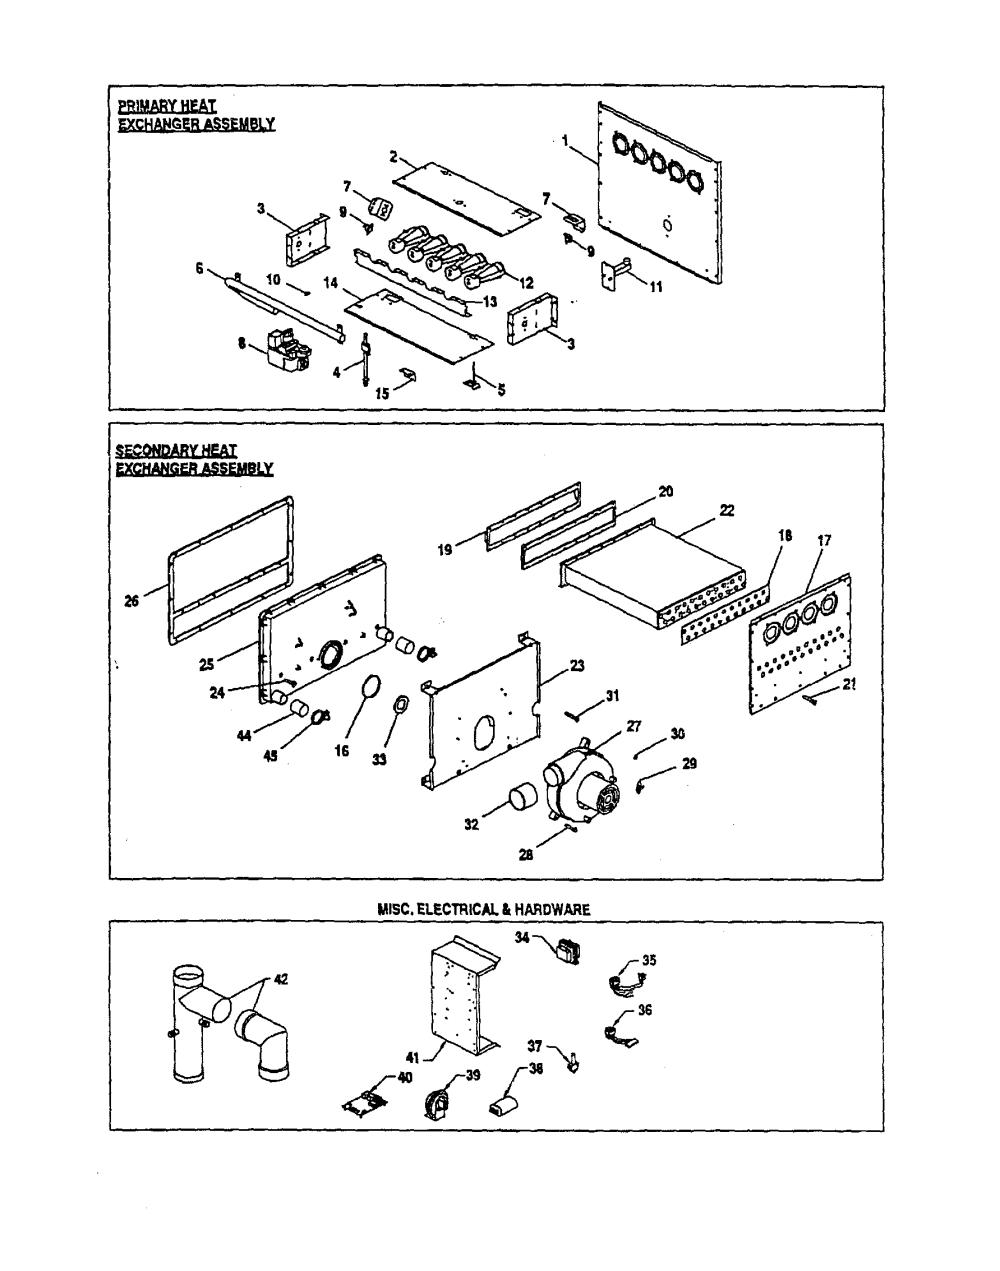 medium resolution of goodman gmn060 3 heat exchangers misc electrical diagram